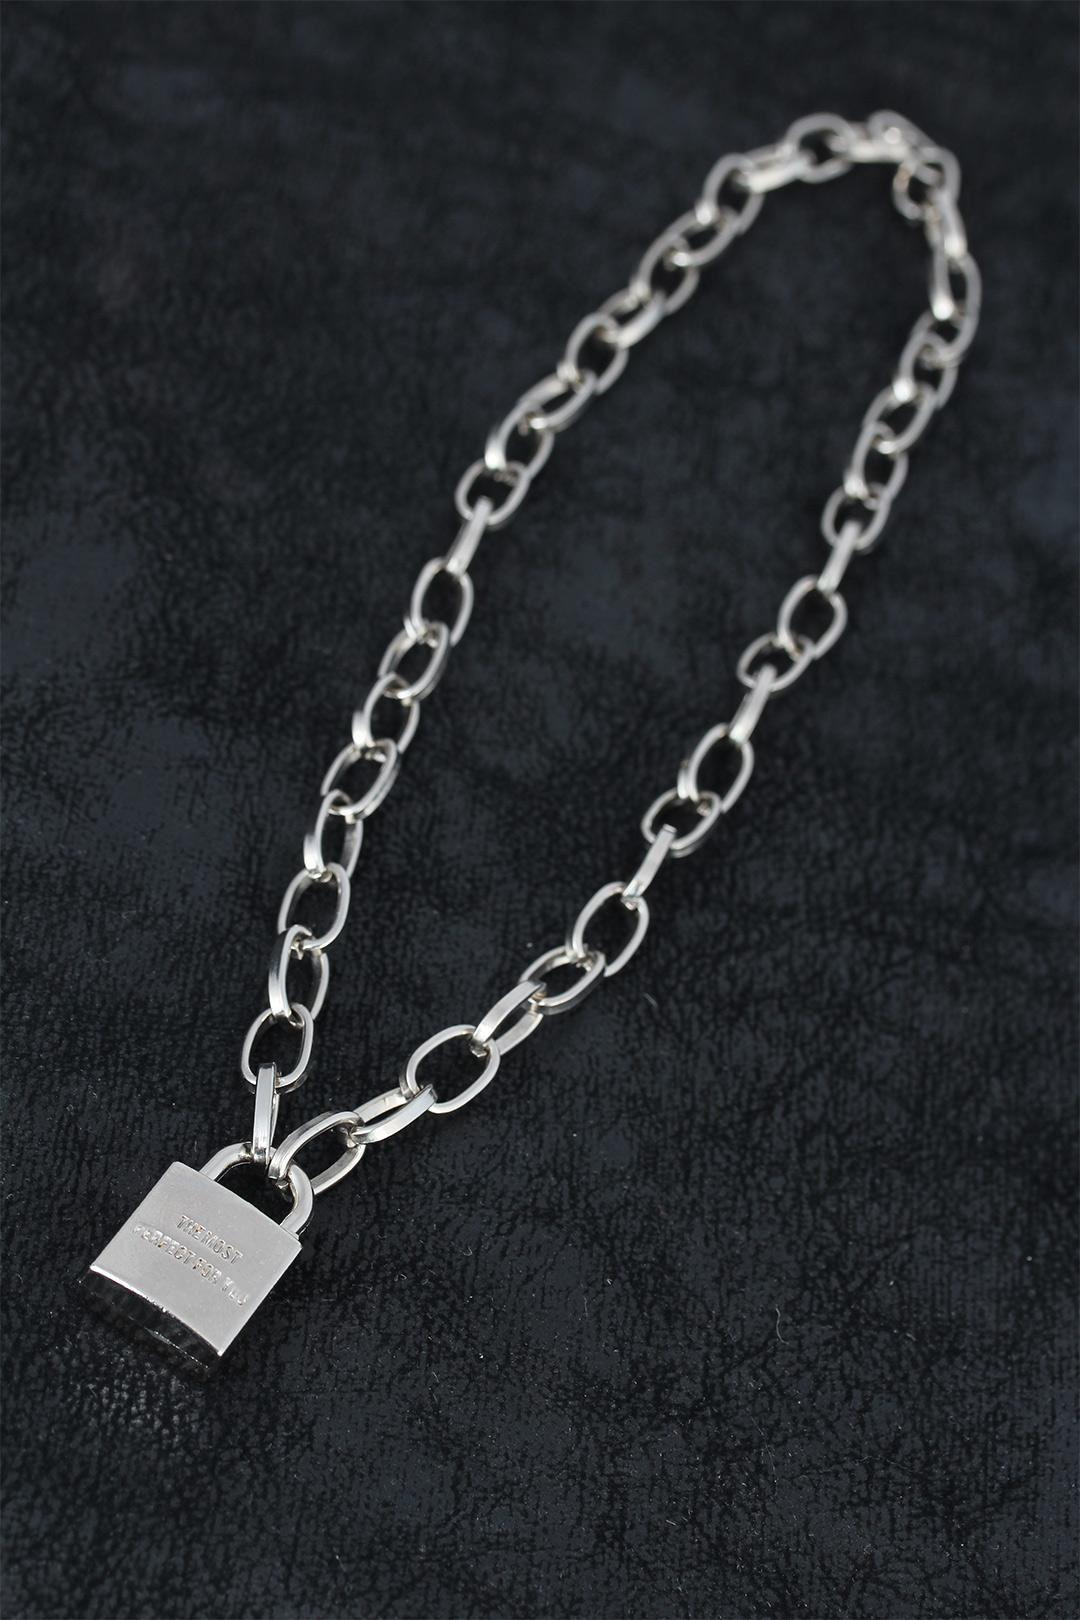 Silver Renk Metal Zincirli ve Kilitli Erkek Kolye